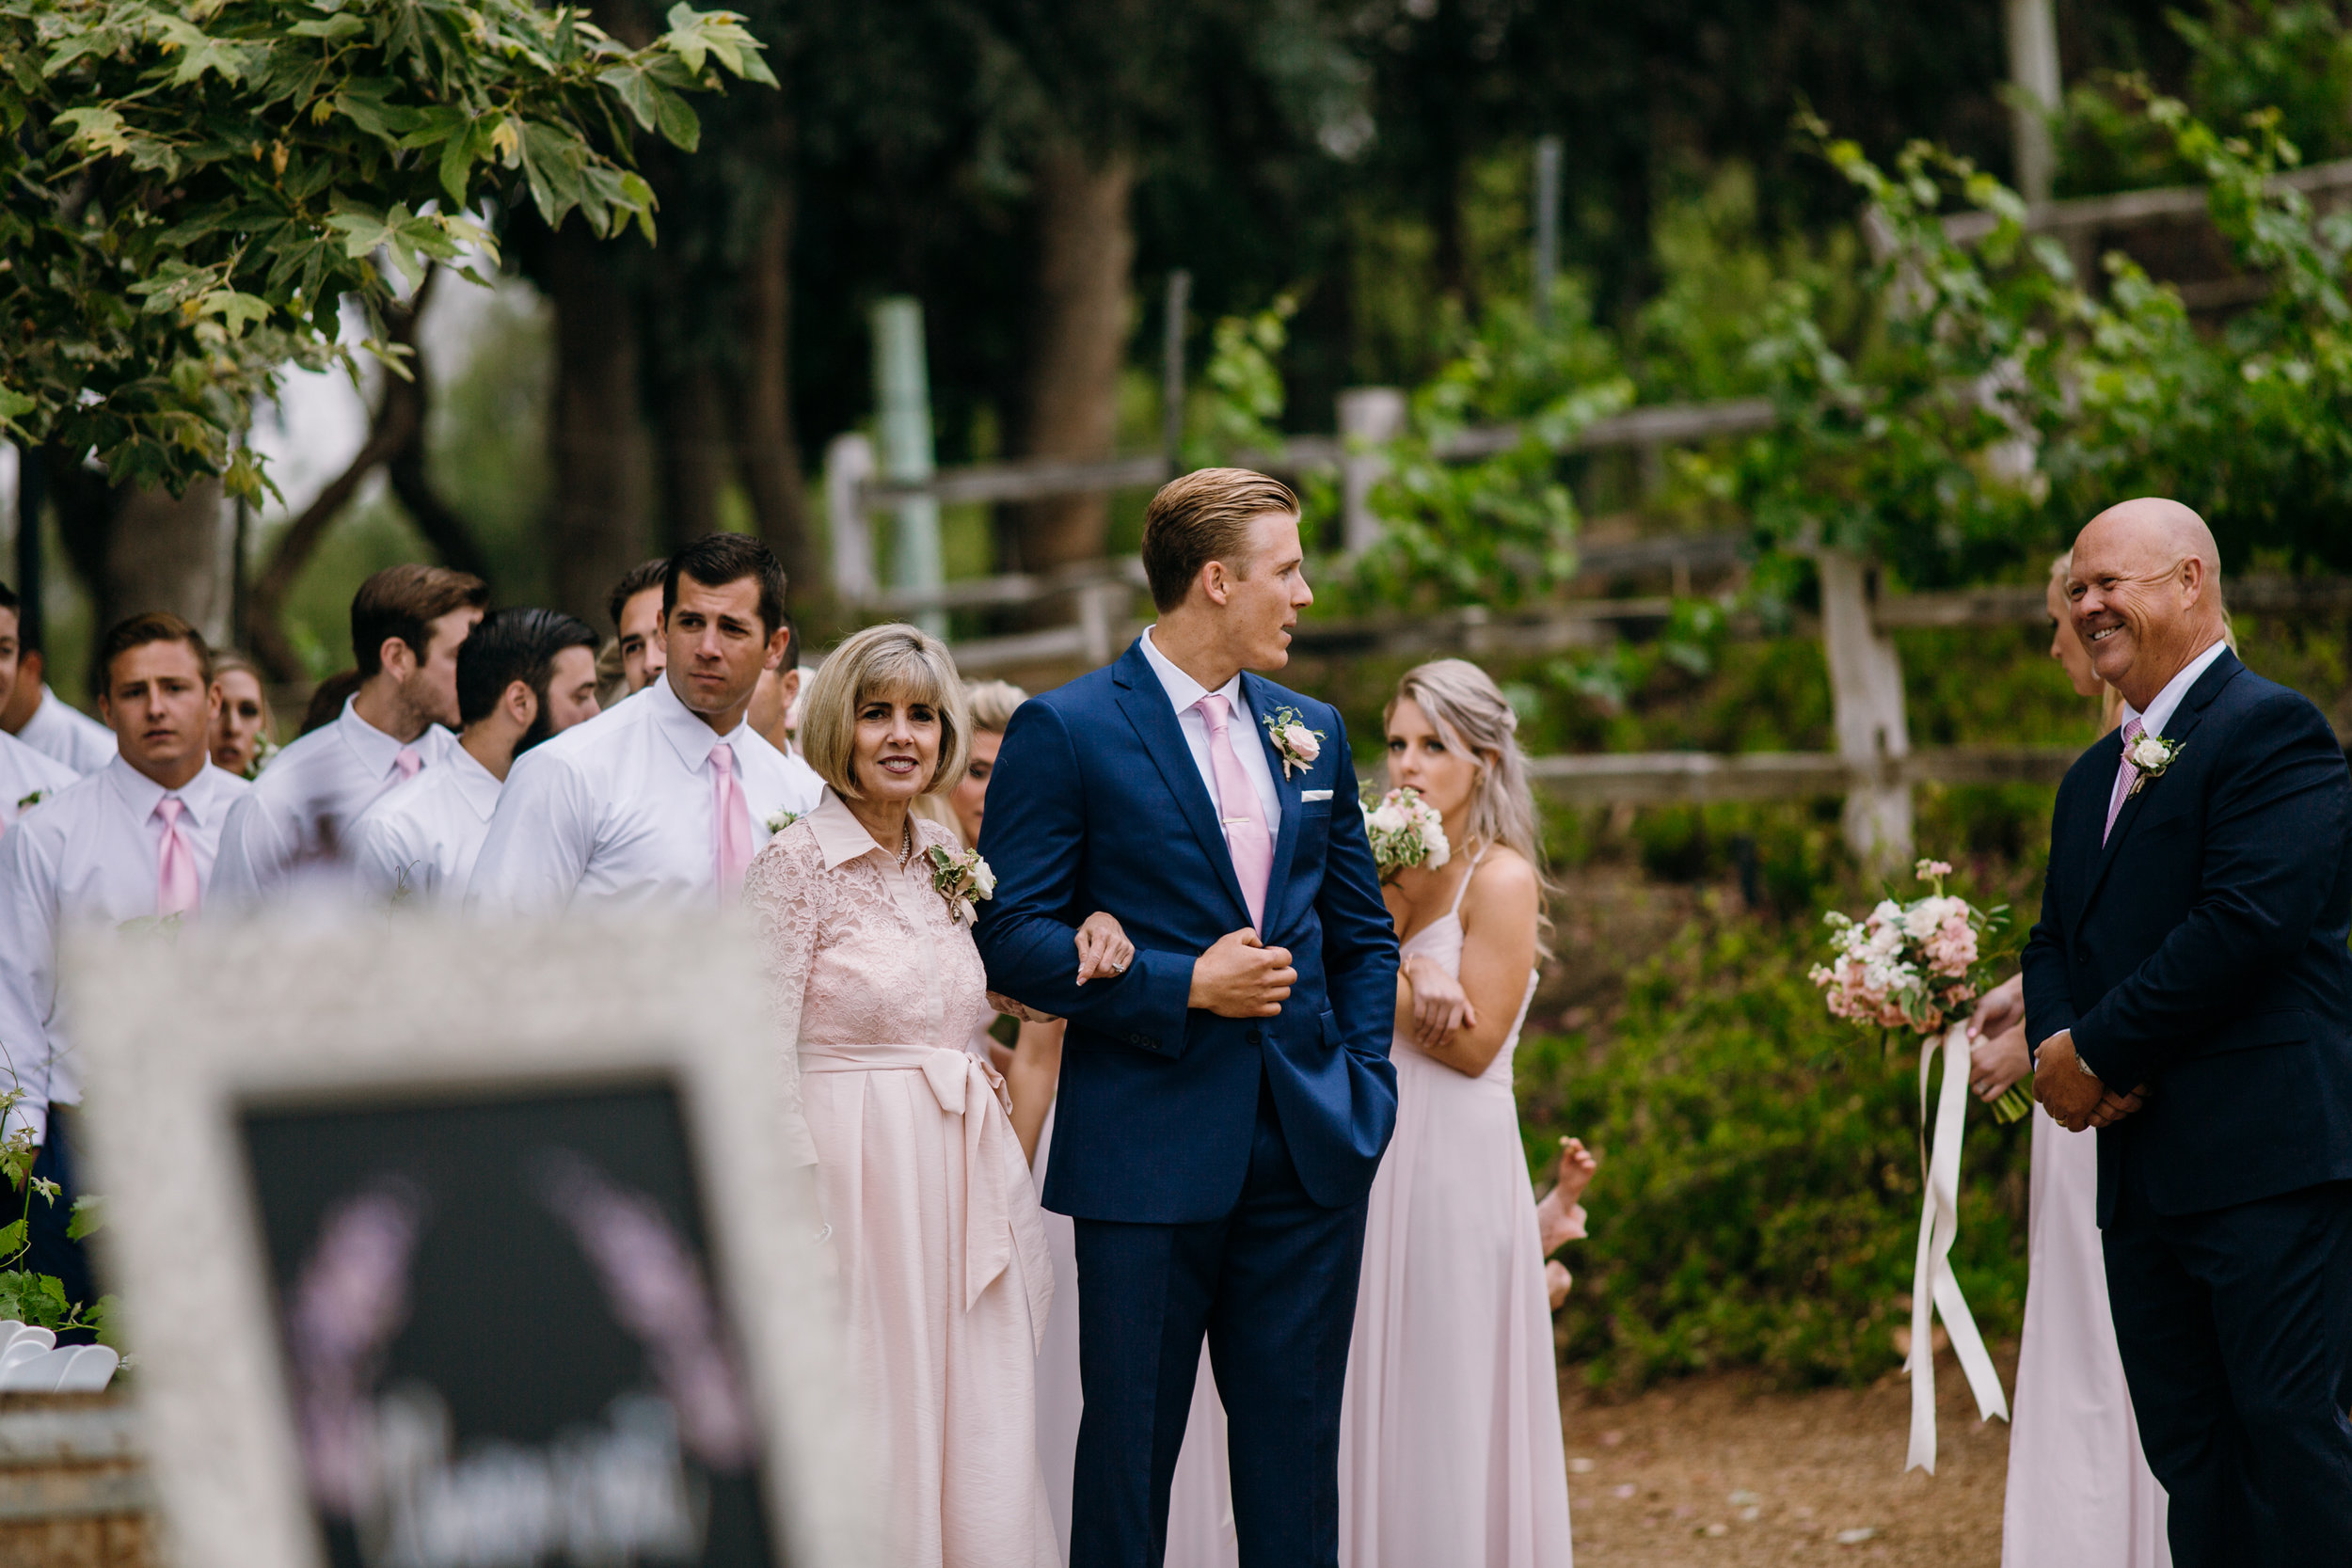 KaraNixonWeddings-LakeOakMeadows-Temecula-Wedding-25.jpg